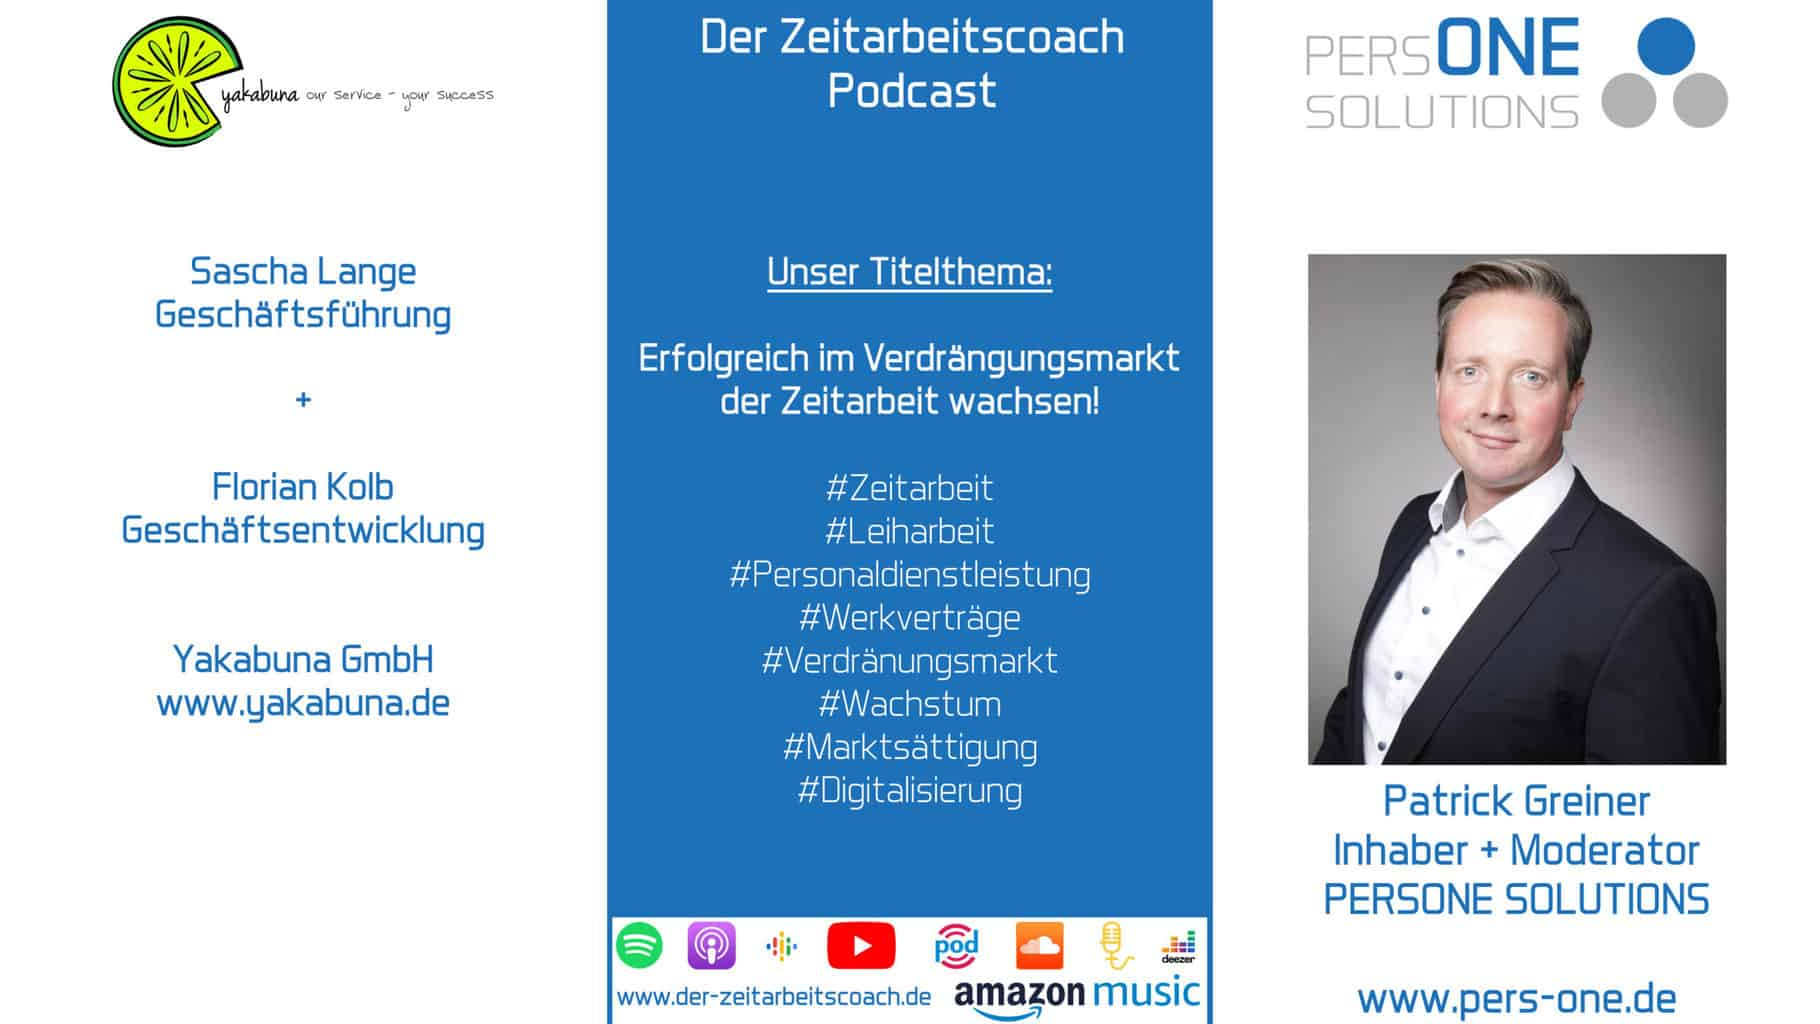 yakabuna_Podcast SM Grafik-Interview_Zeitarbeitscoach-Podcast